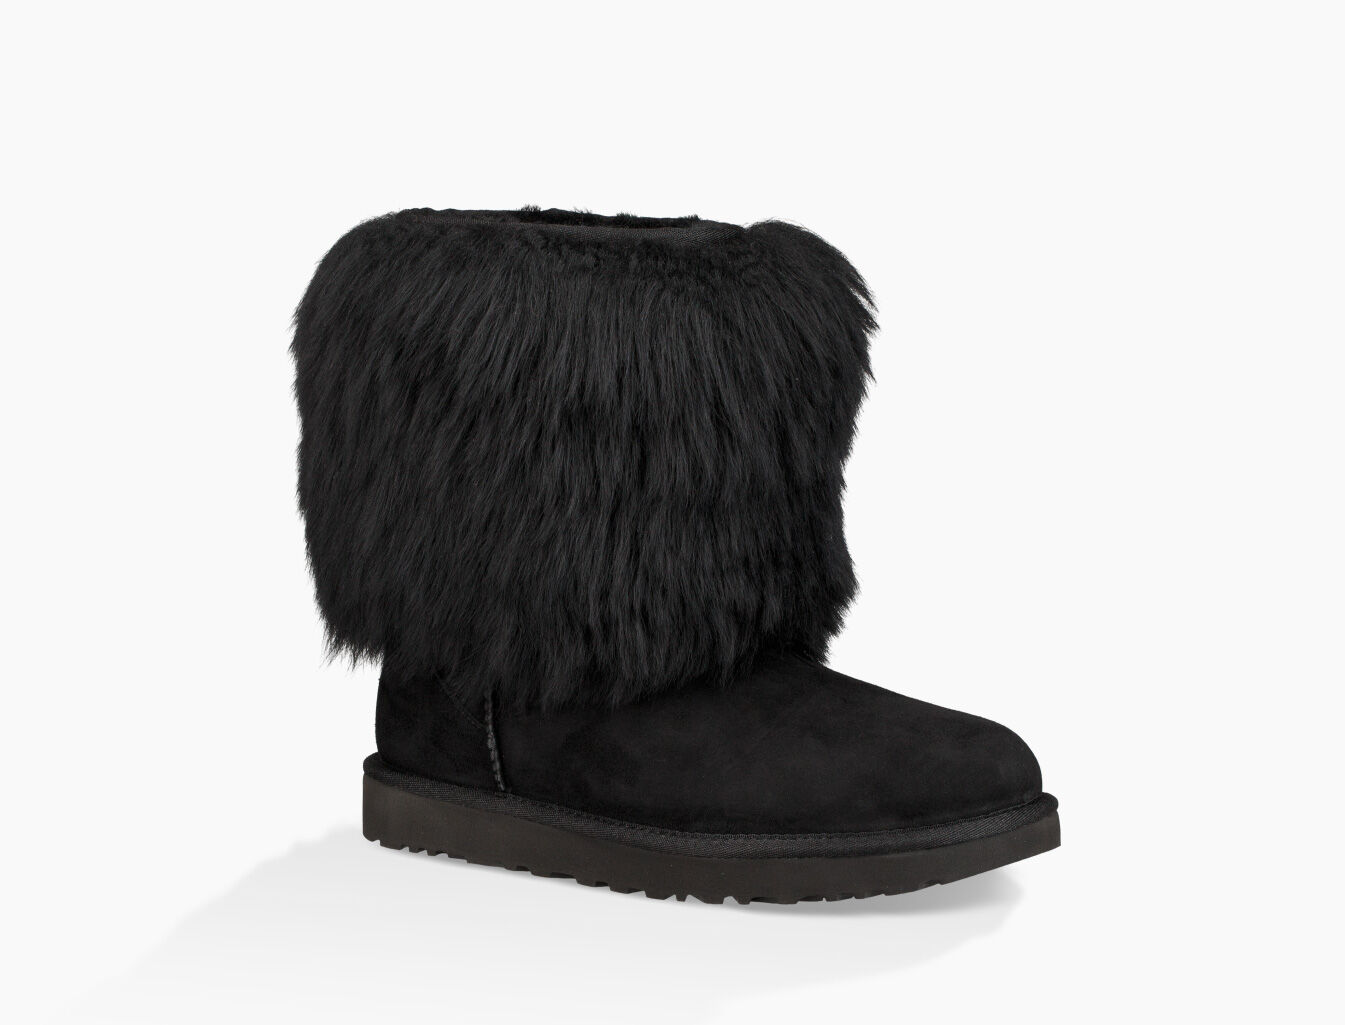 ugg boots with sheepskin cuff